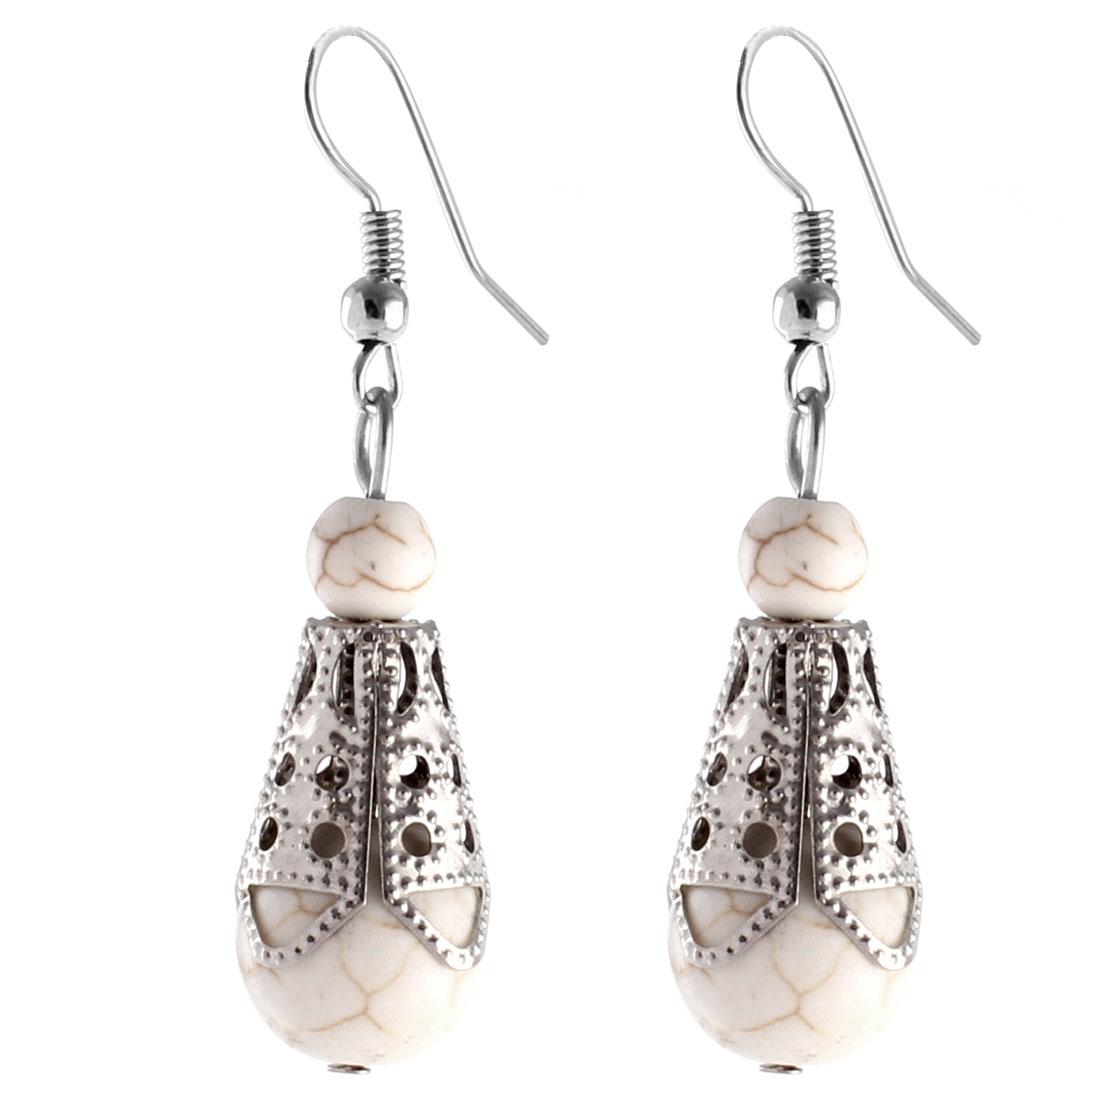 Pair Retro Style White Plastic Bead Pendant Dangling Hook Ear Drops Earrings Eardrops for Lady